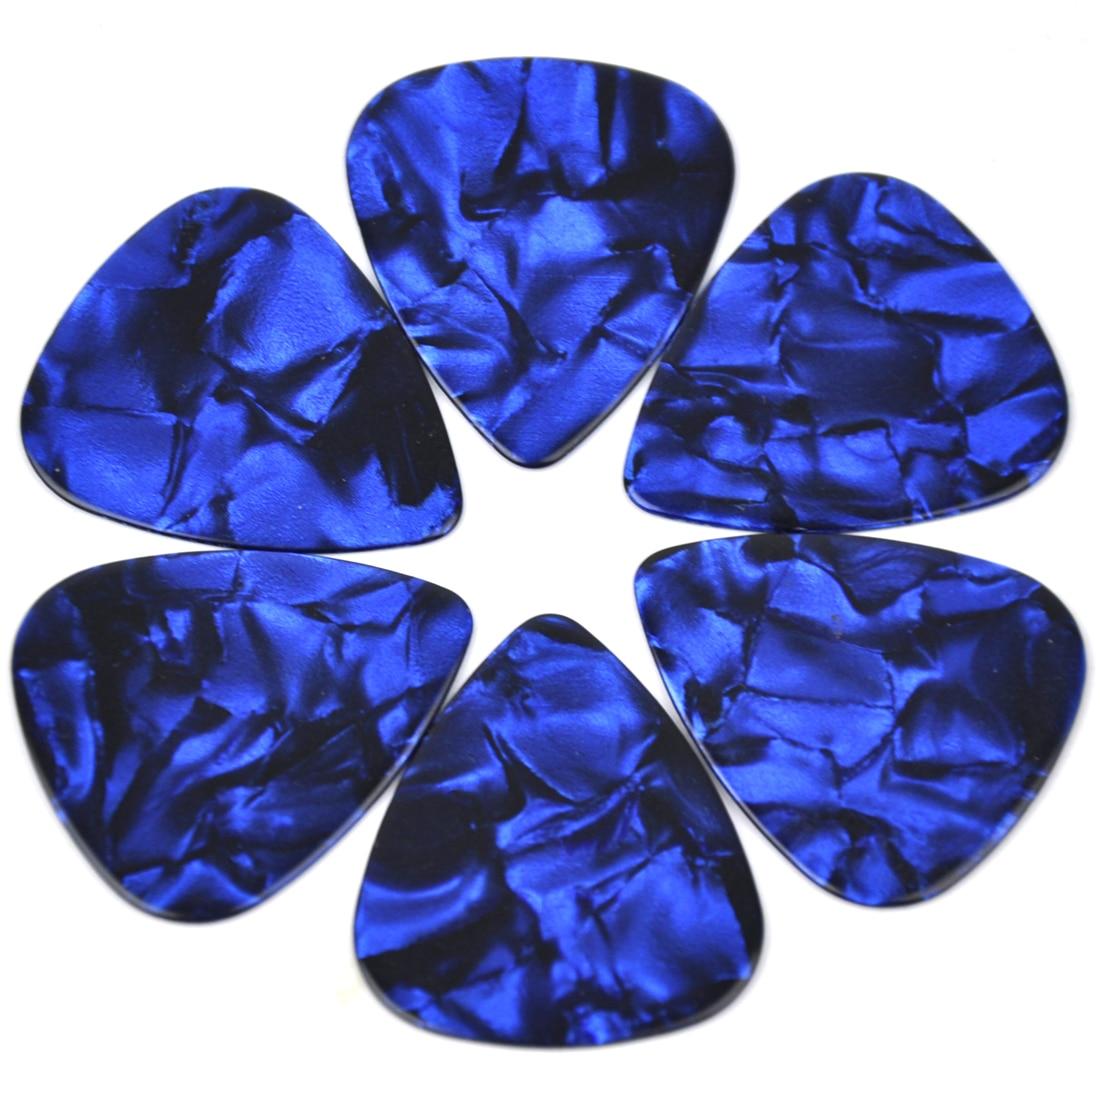 Wholesale 1000pcs Medium 0.71mm Blank Guitar Picks Plectrums Celluloid Pearl Blue enlarge